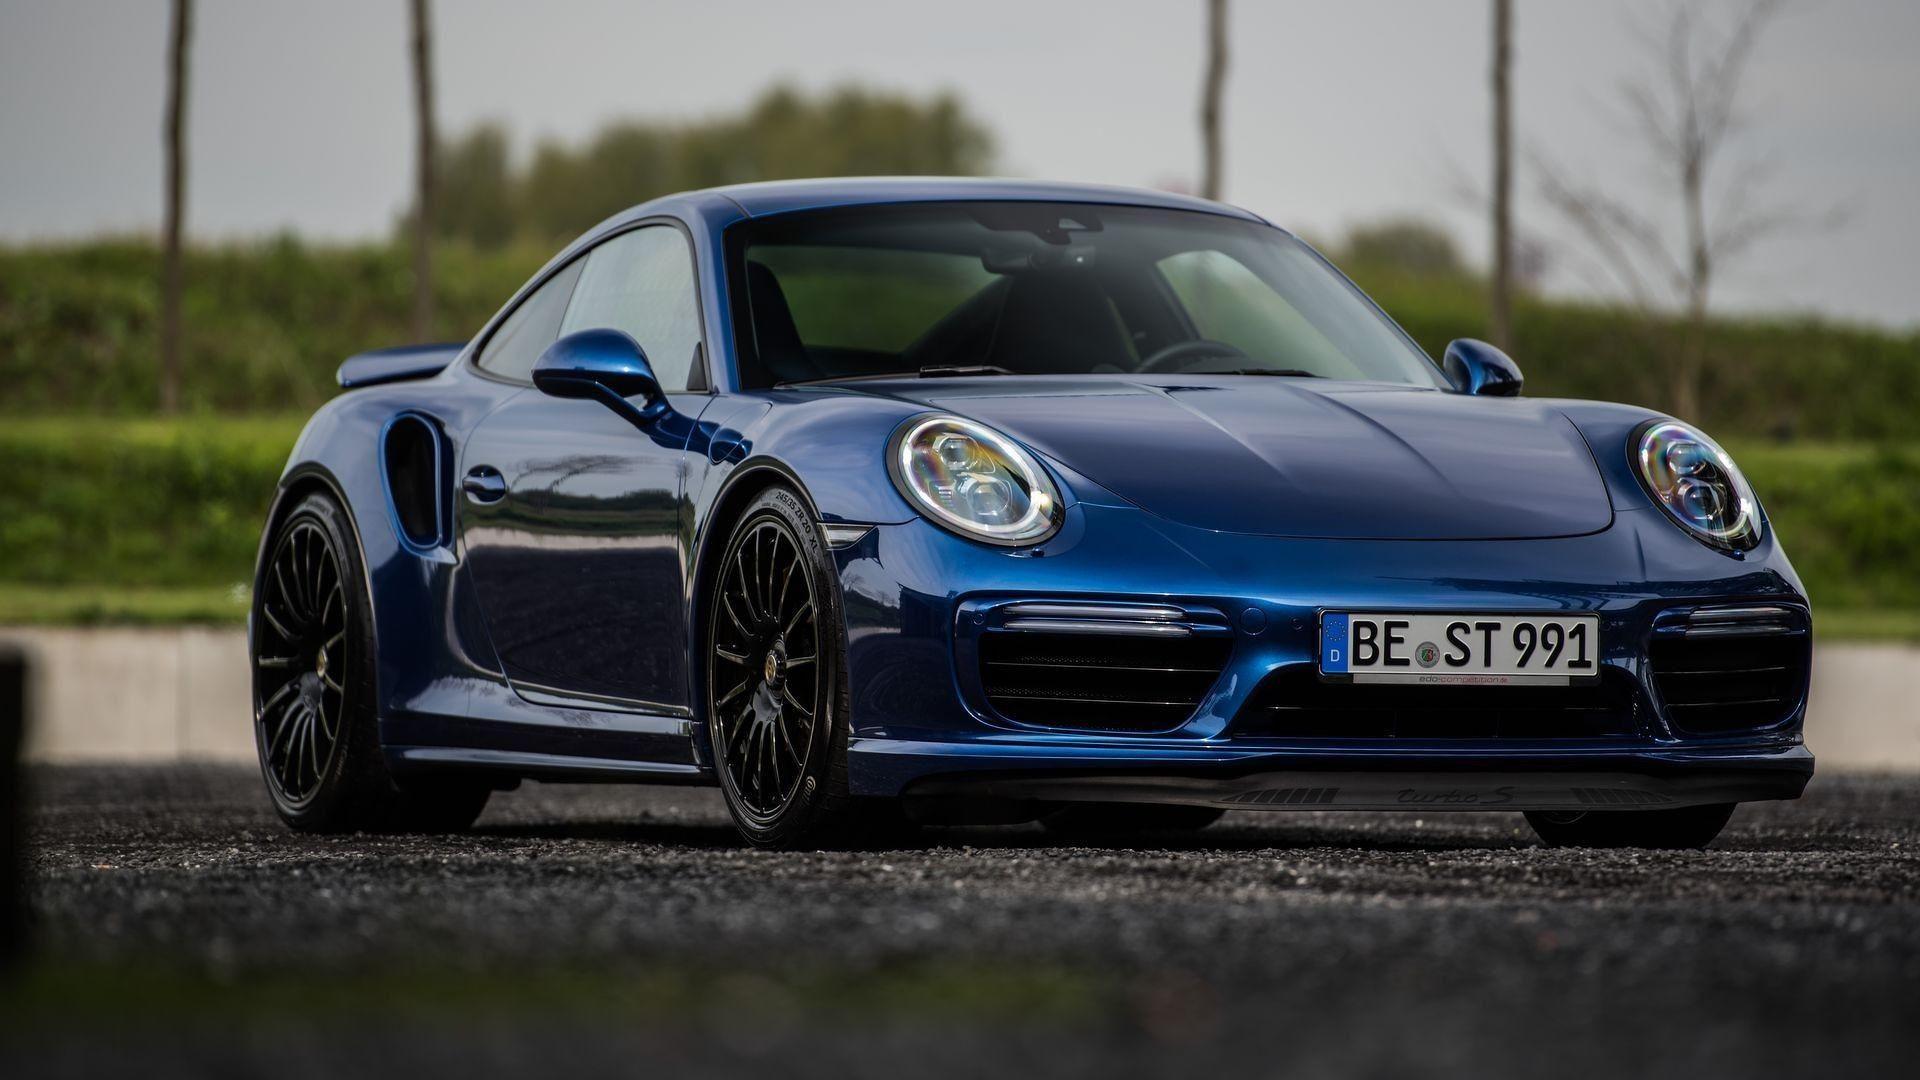 Porsche 911 Turbo S Exclusive Serie By Edo Competition Porsche Turbo S Porsche 911 Porsche 911 Turbo